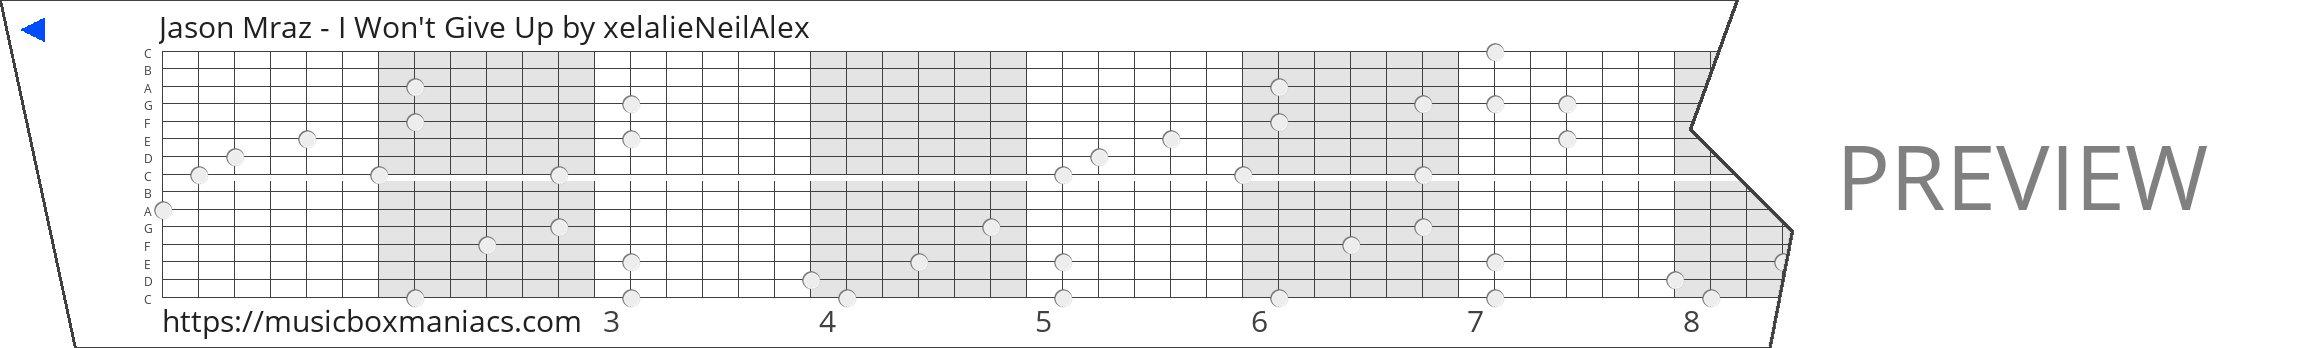 Jason Mraz - I Won't Give Up 15 note music box paper strip